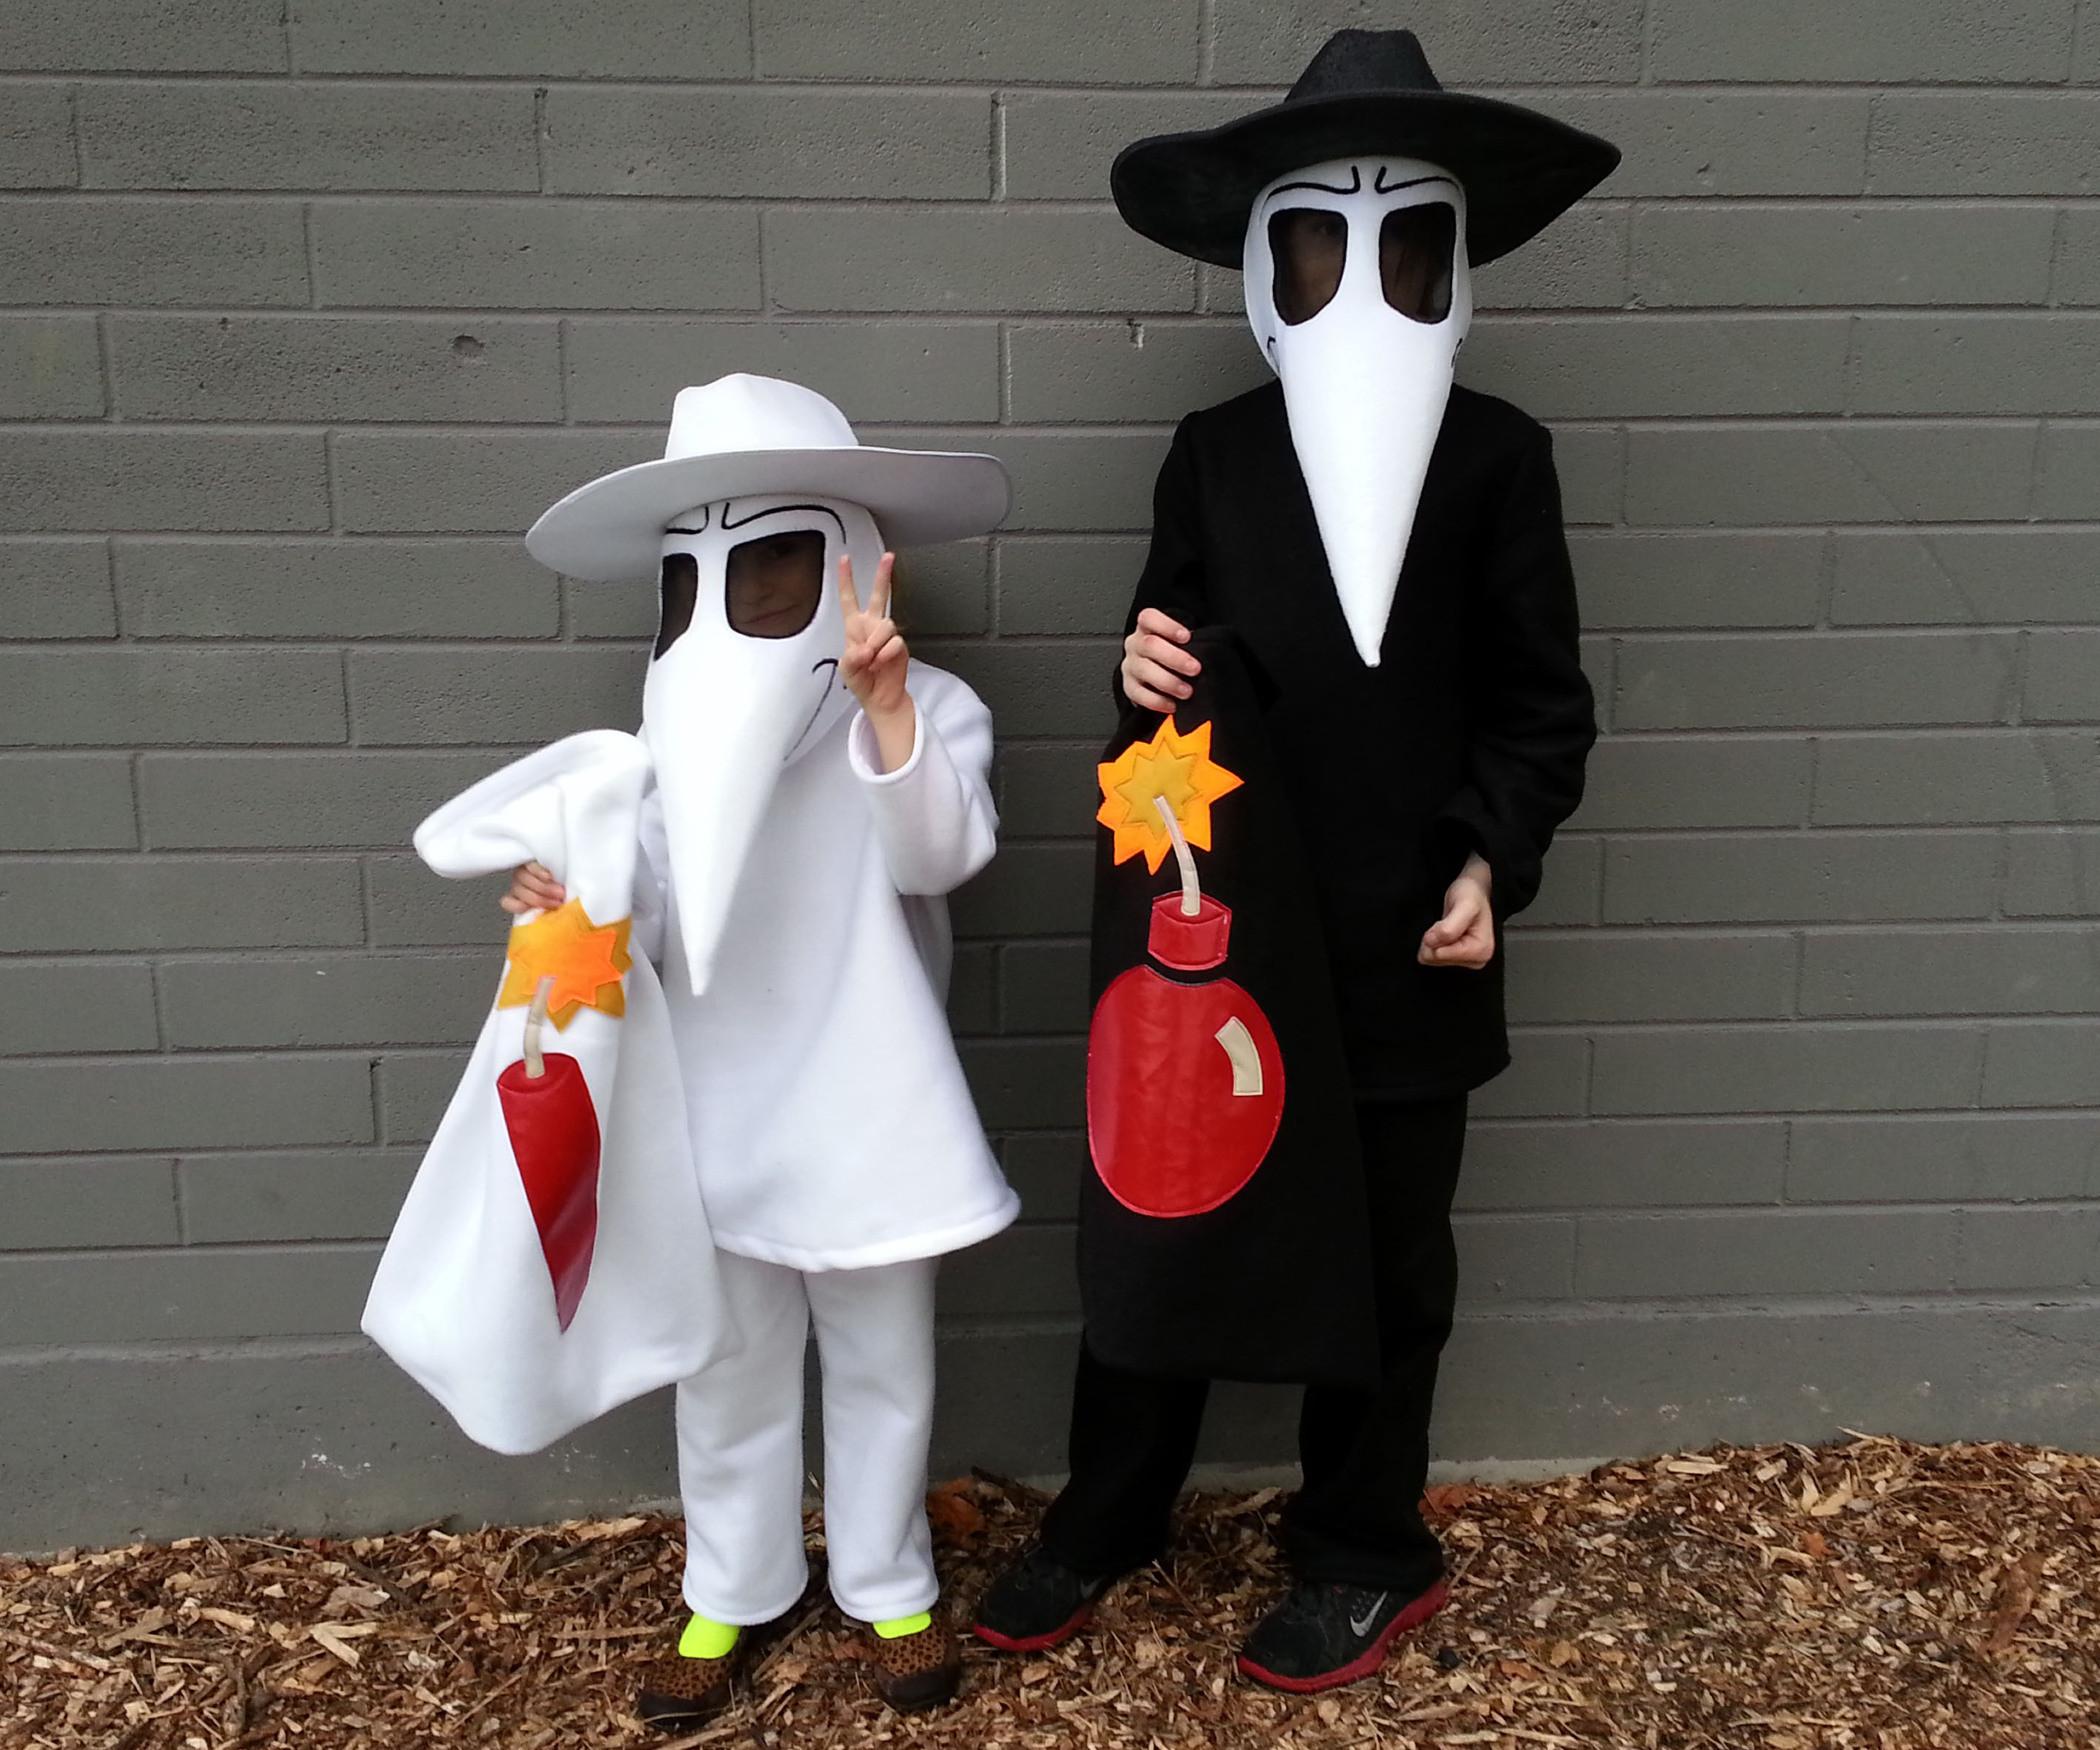 Best ideas about Spy Costume DIY . Save or Pin Spy vs Spy Now.